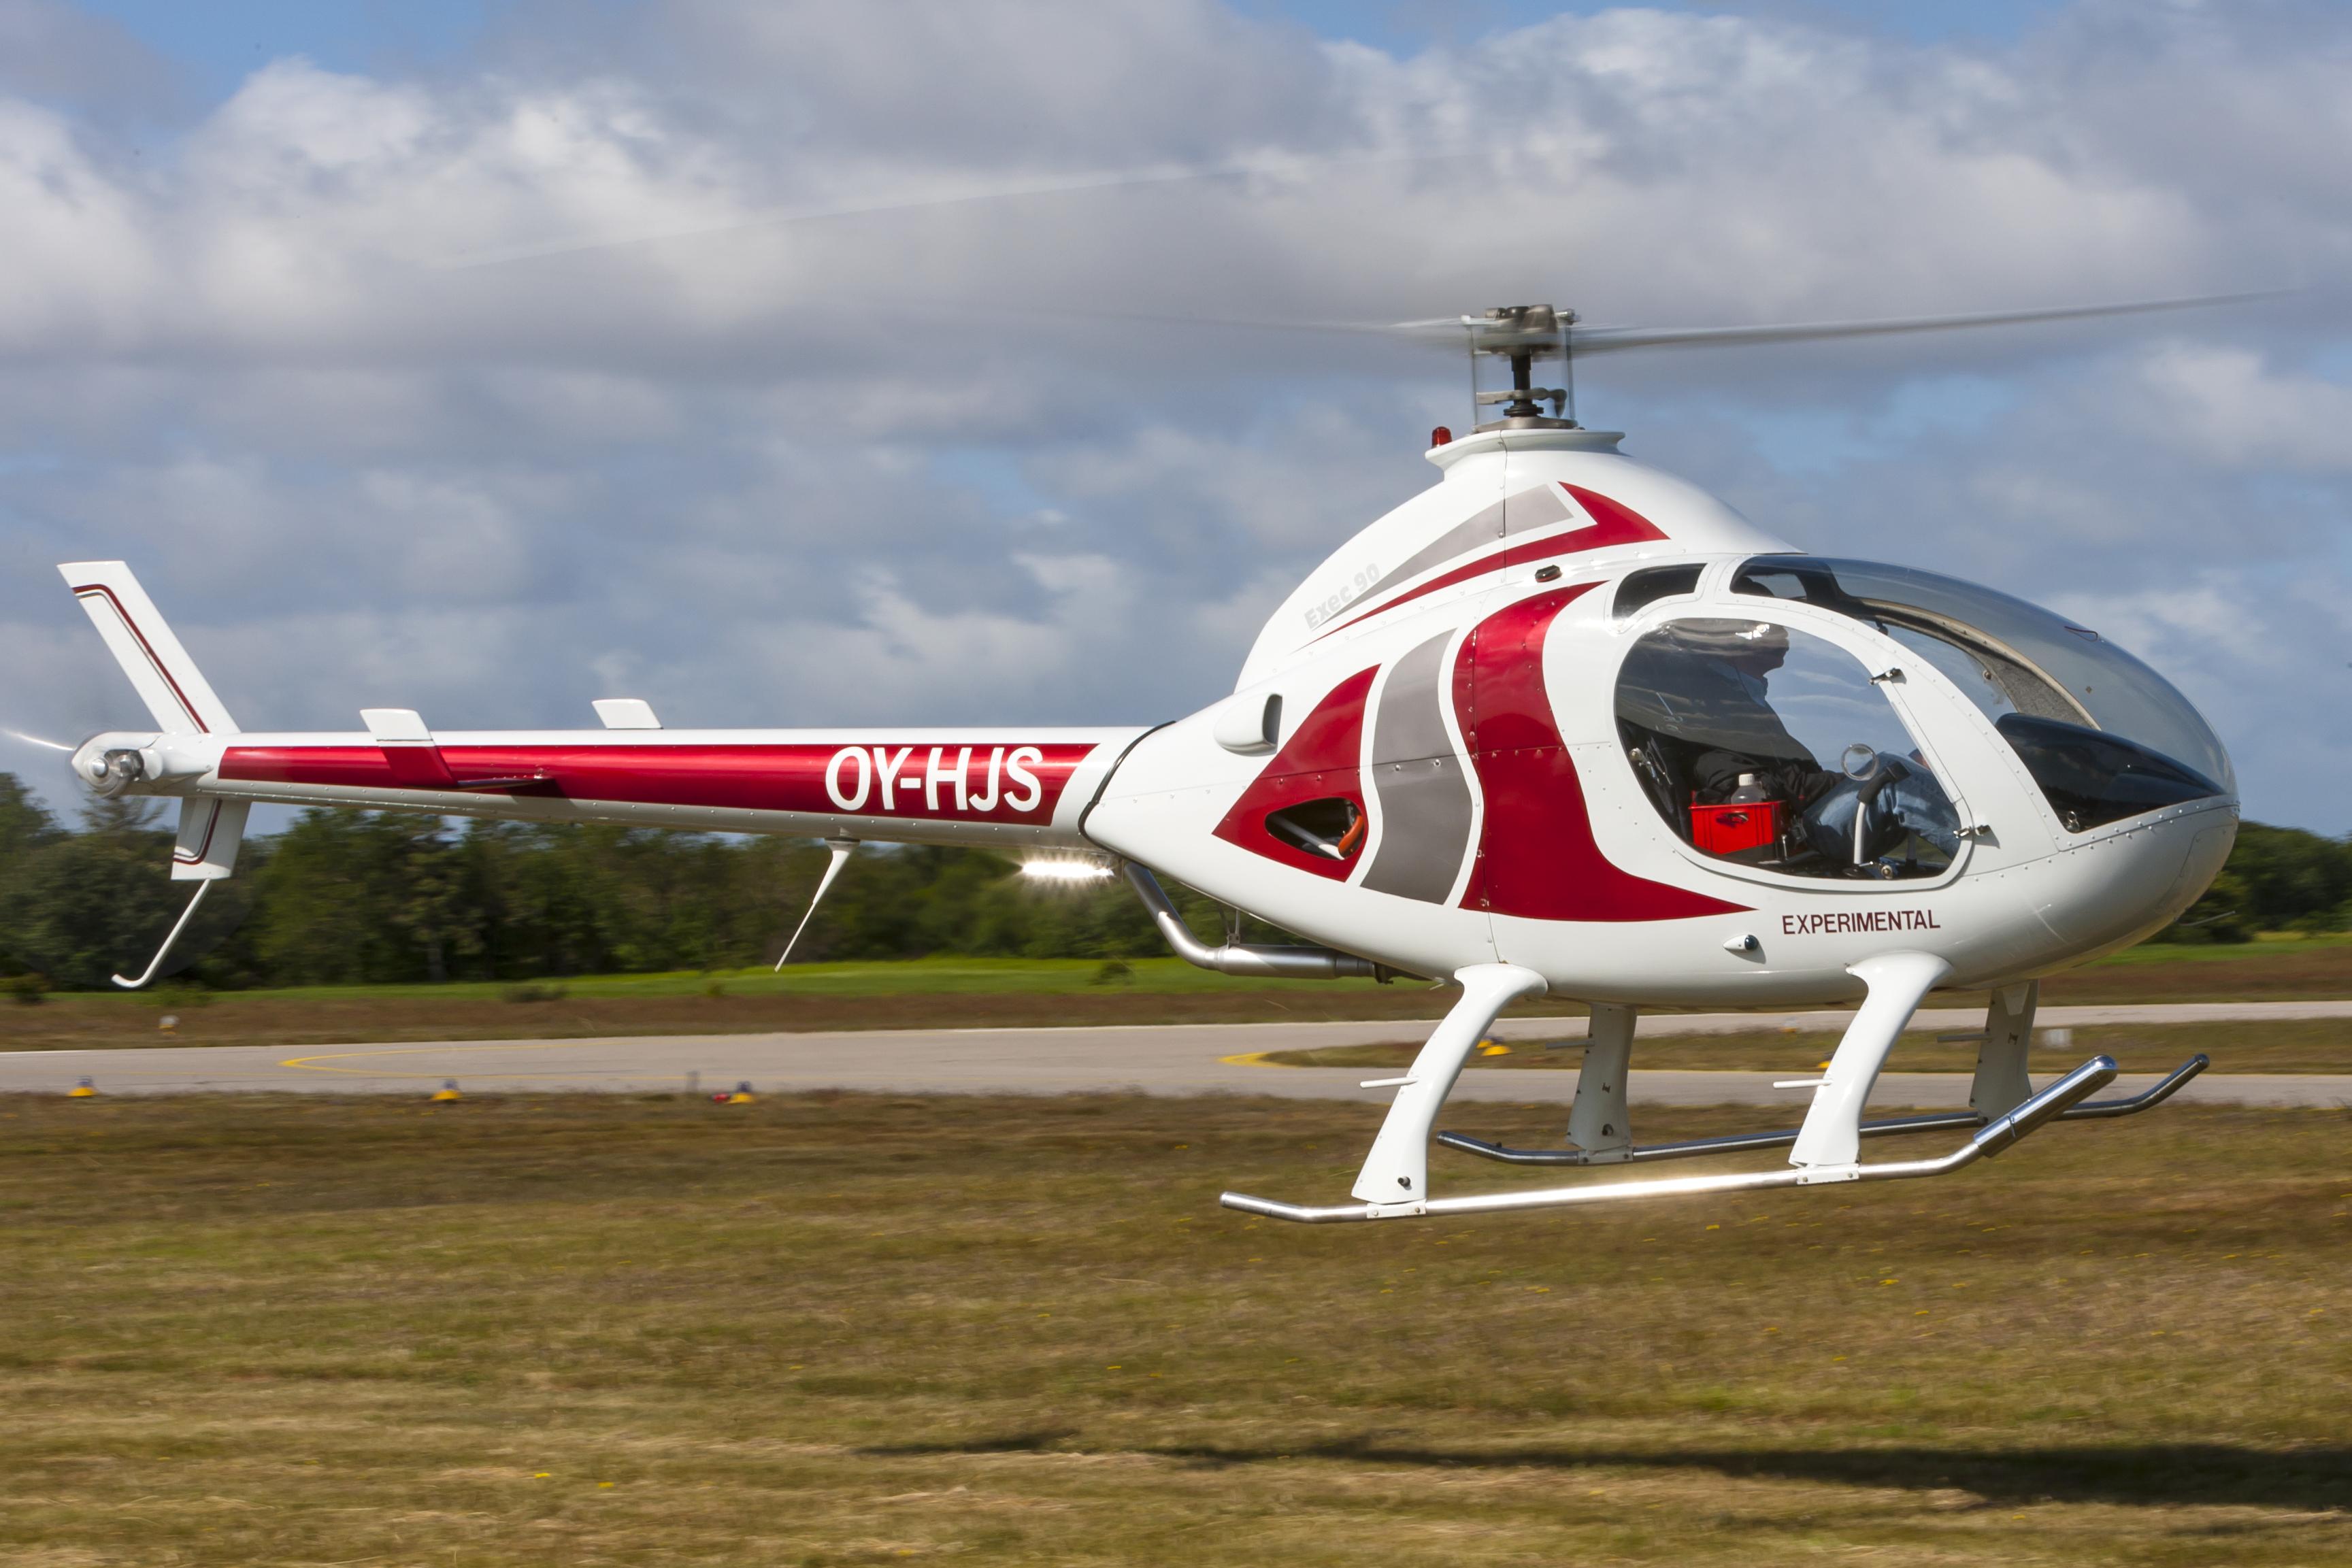 OY-HJS-RotorwayExec90-2